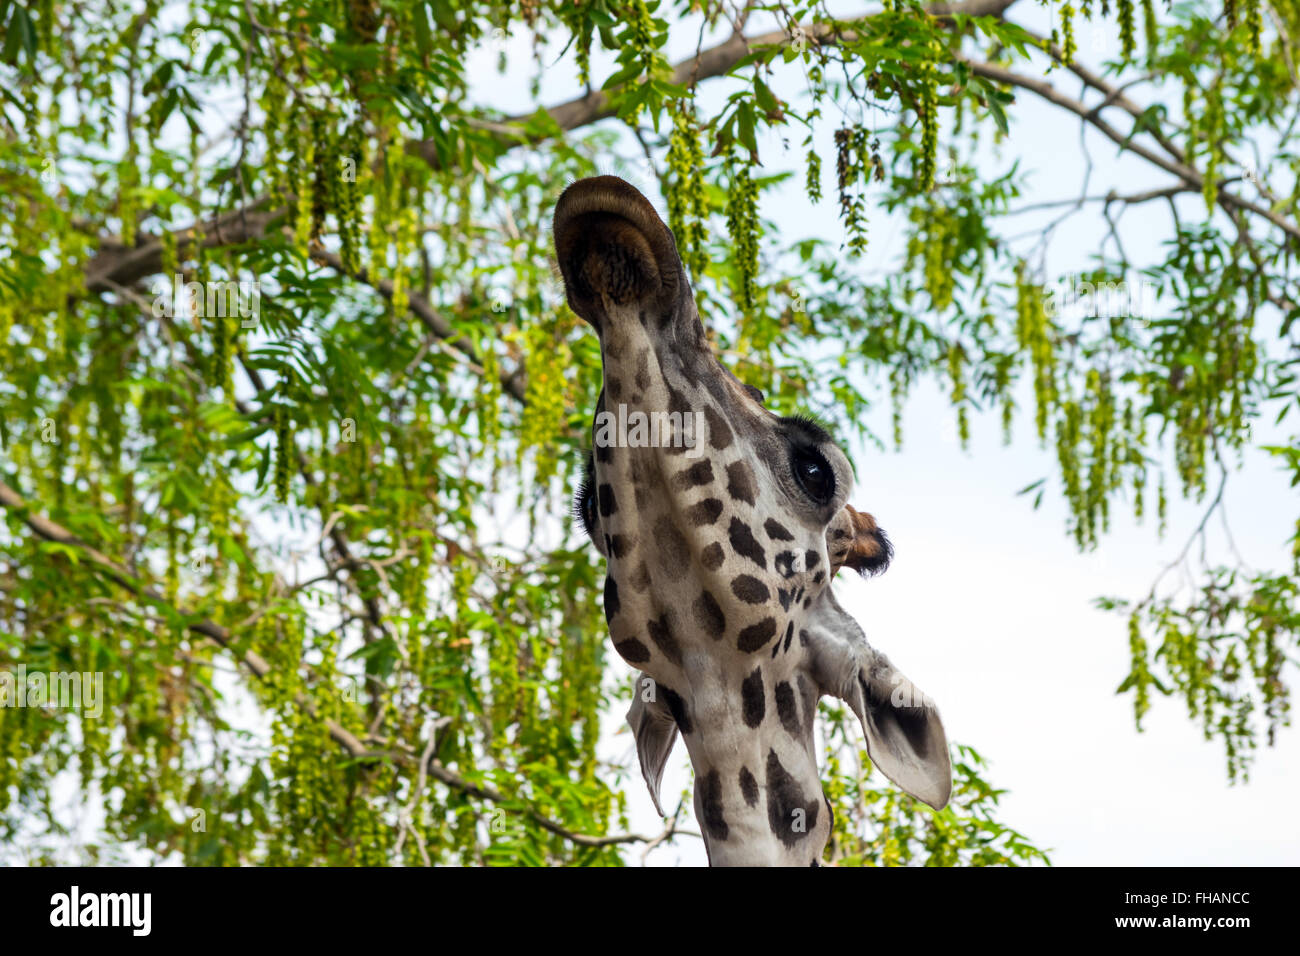 Rothschild's giraffe (Giraffa camelopardalis rothschildi) eating leaves - Stock Image